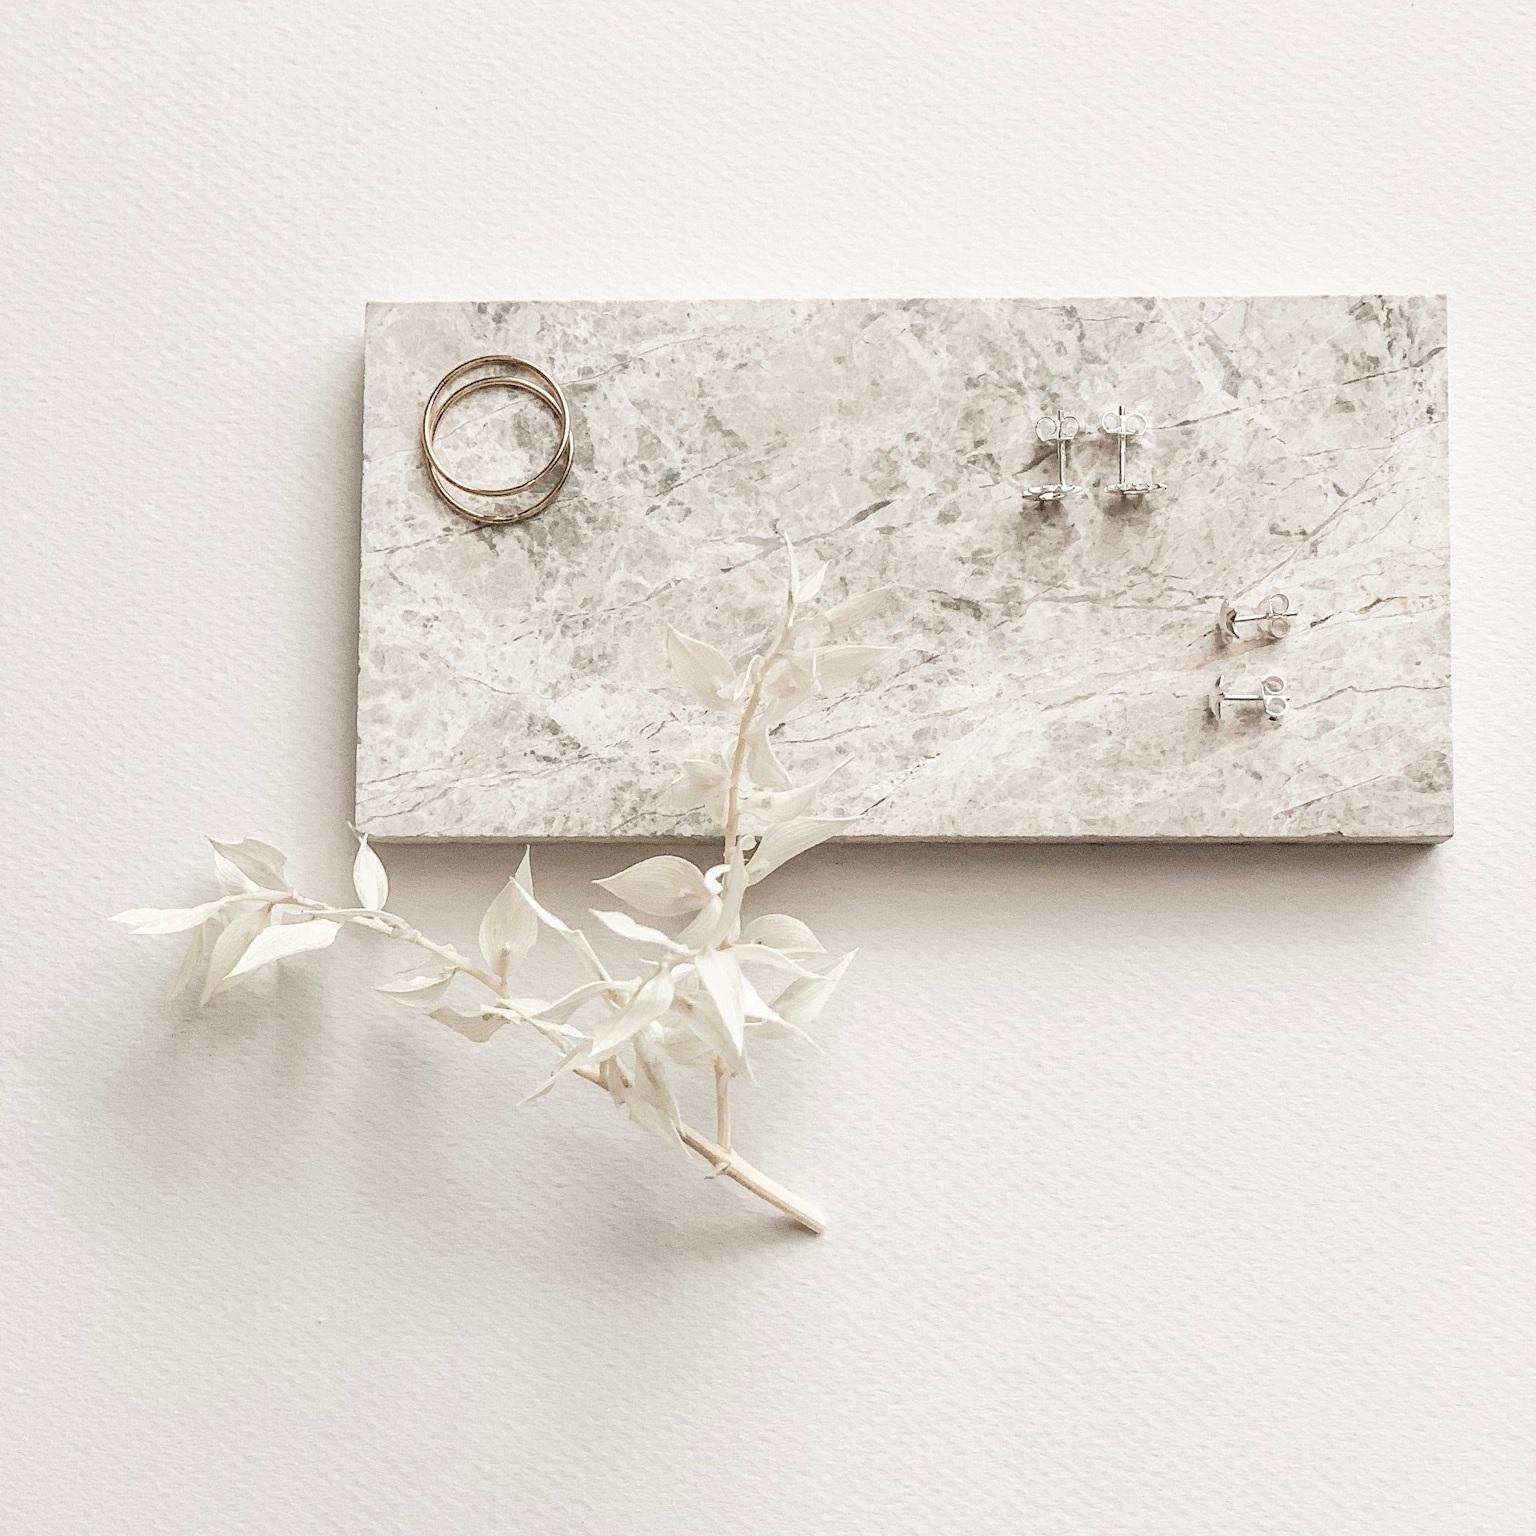 Pouss Jewellery Design